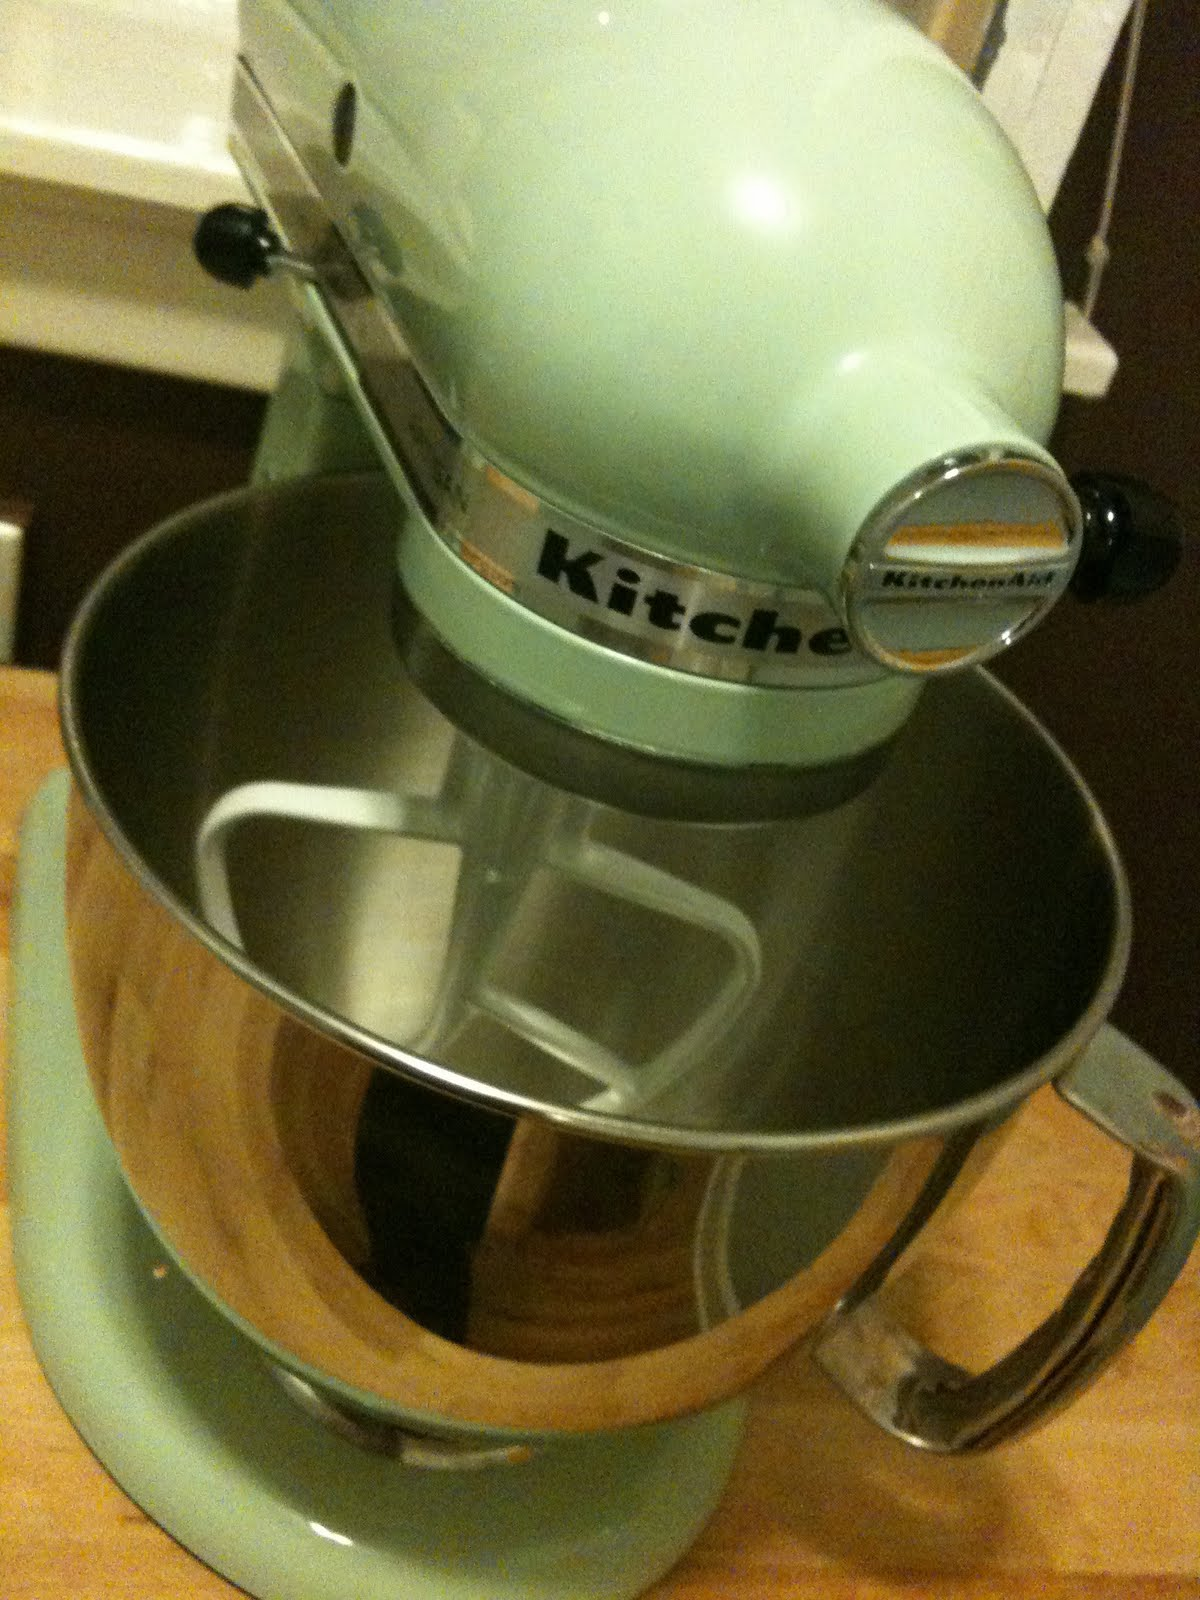 The KitchenAid 5Quart Artisan Stand Mixer All The